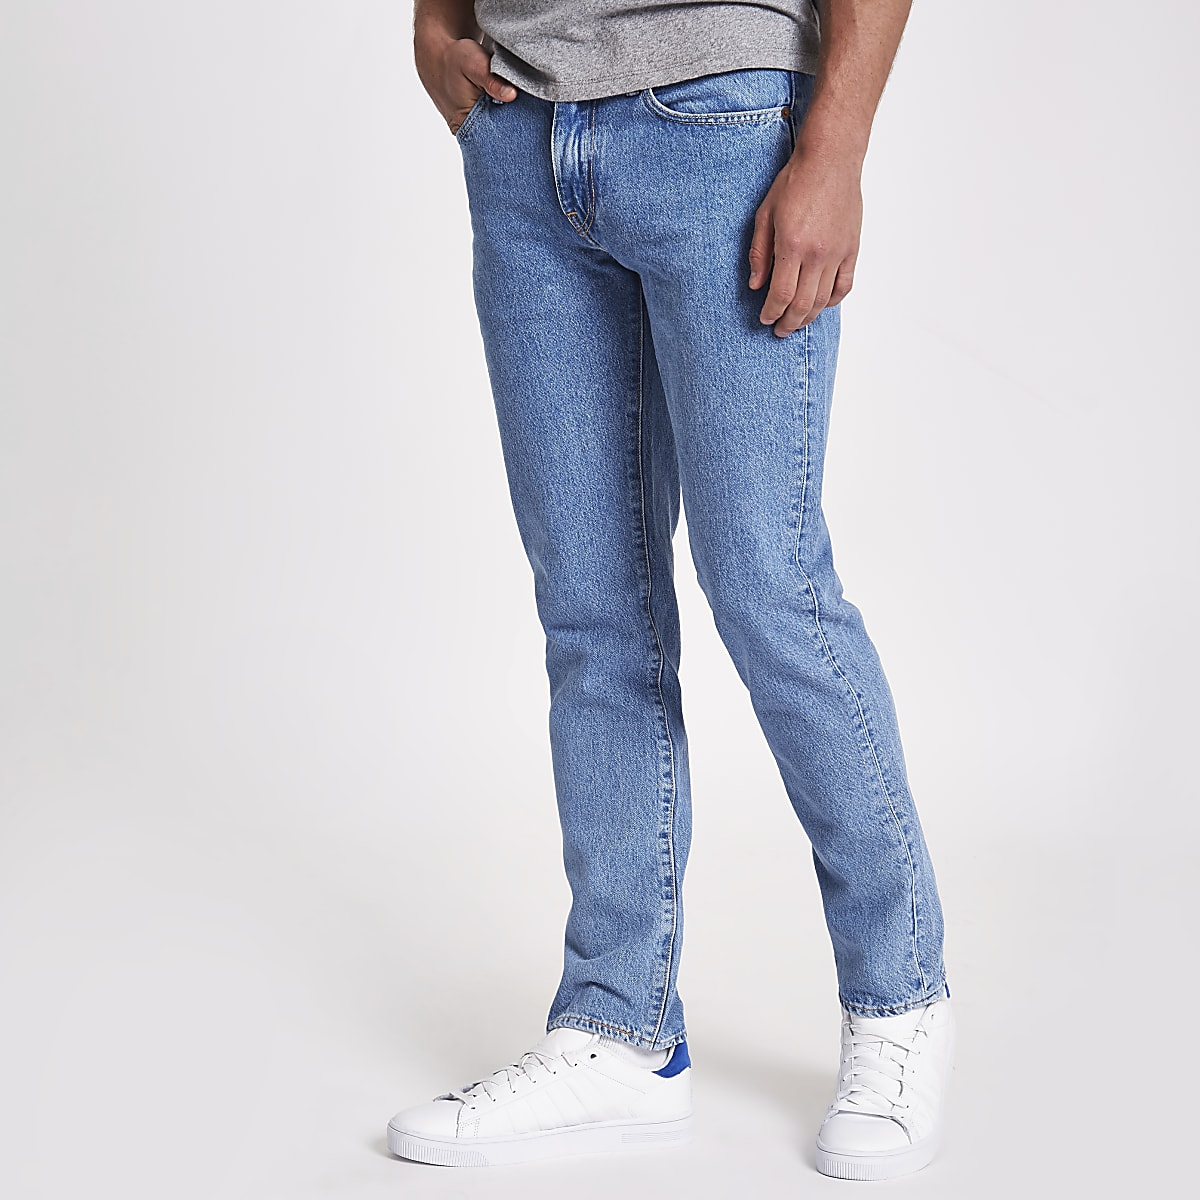 6baba24e5ff8 Levi's light blue 511 slim fit jeans - Slim Jeans - Jeans - men